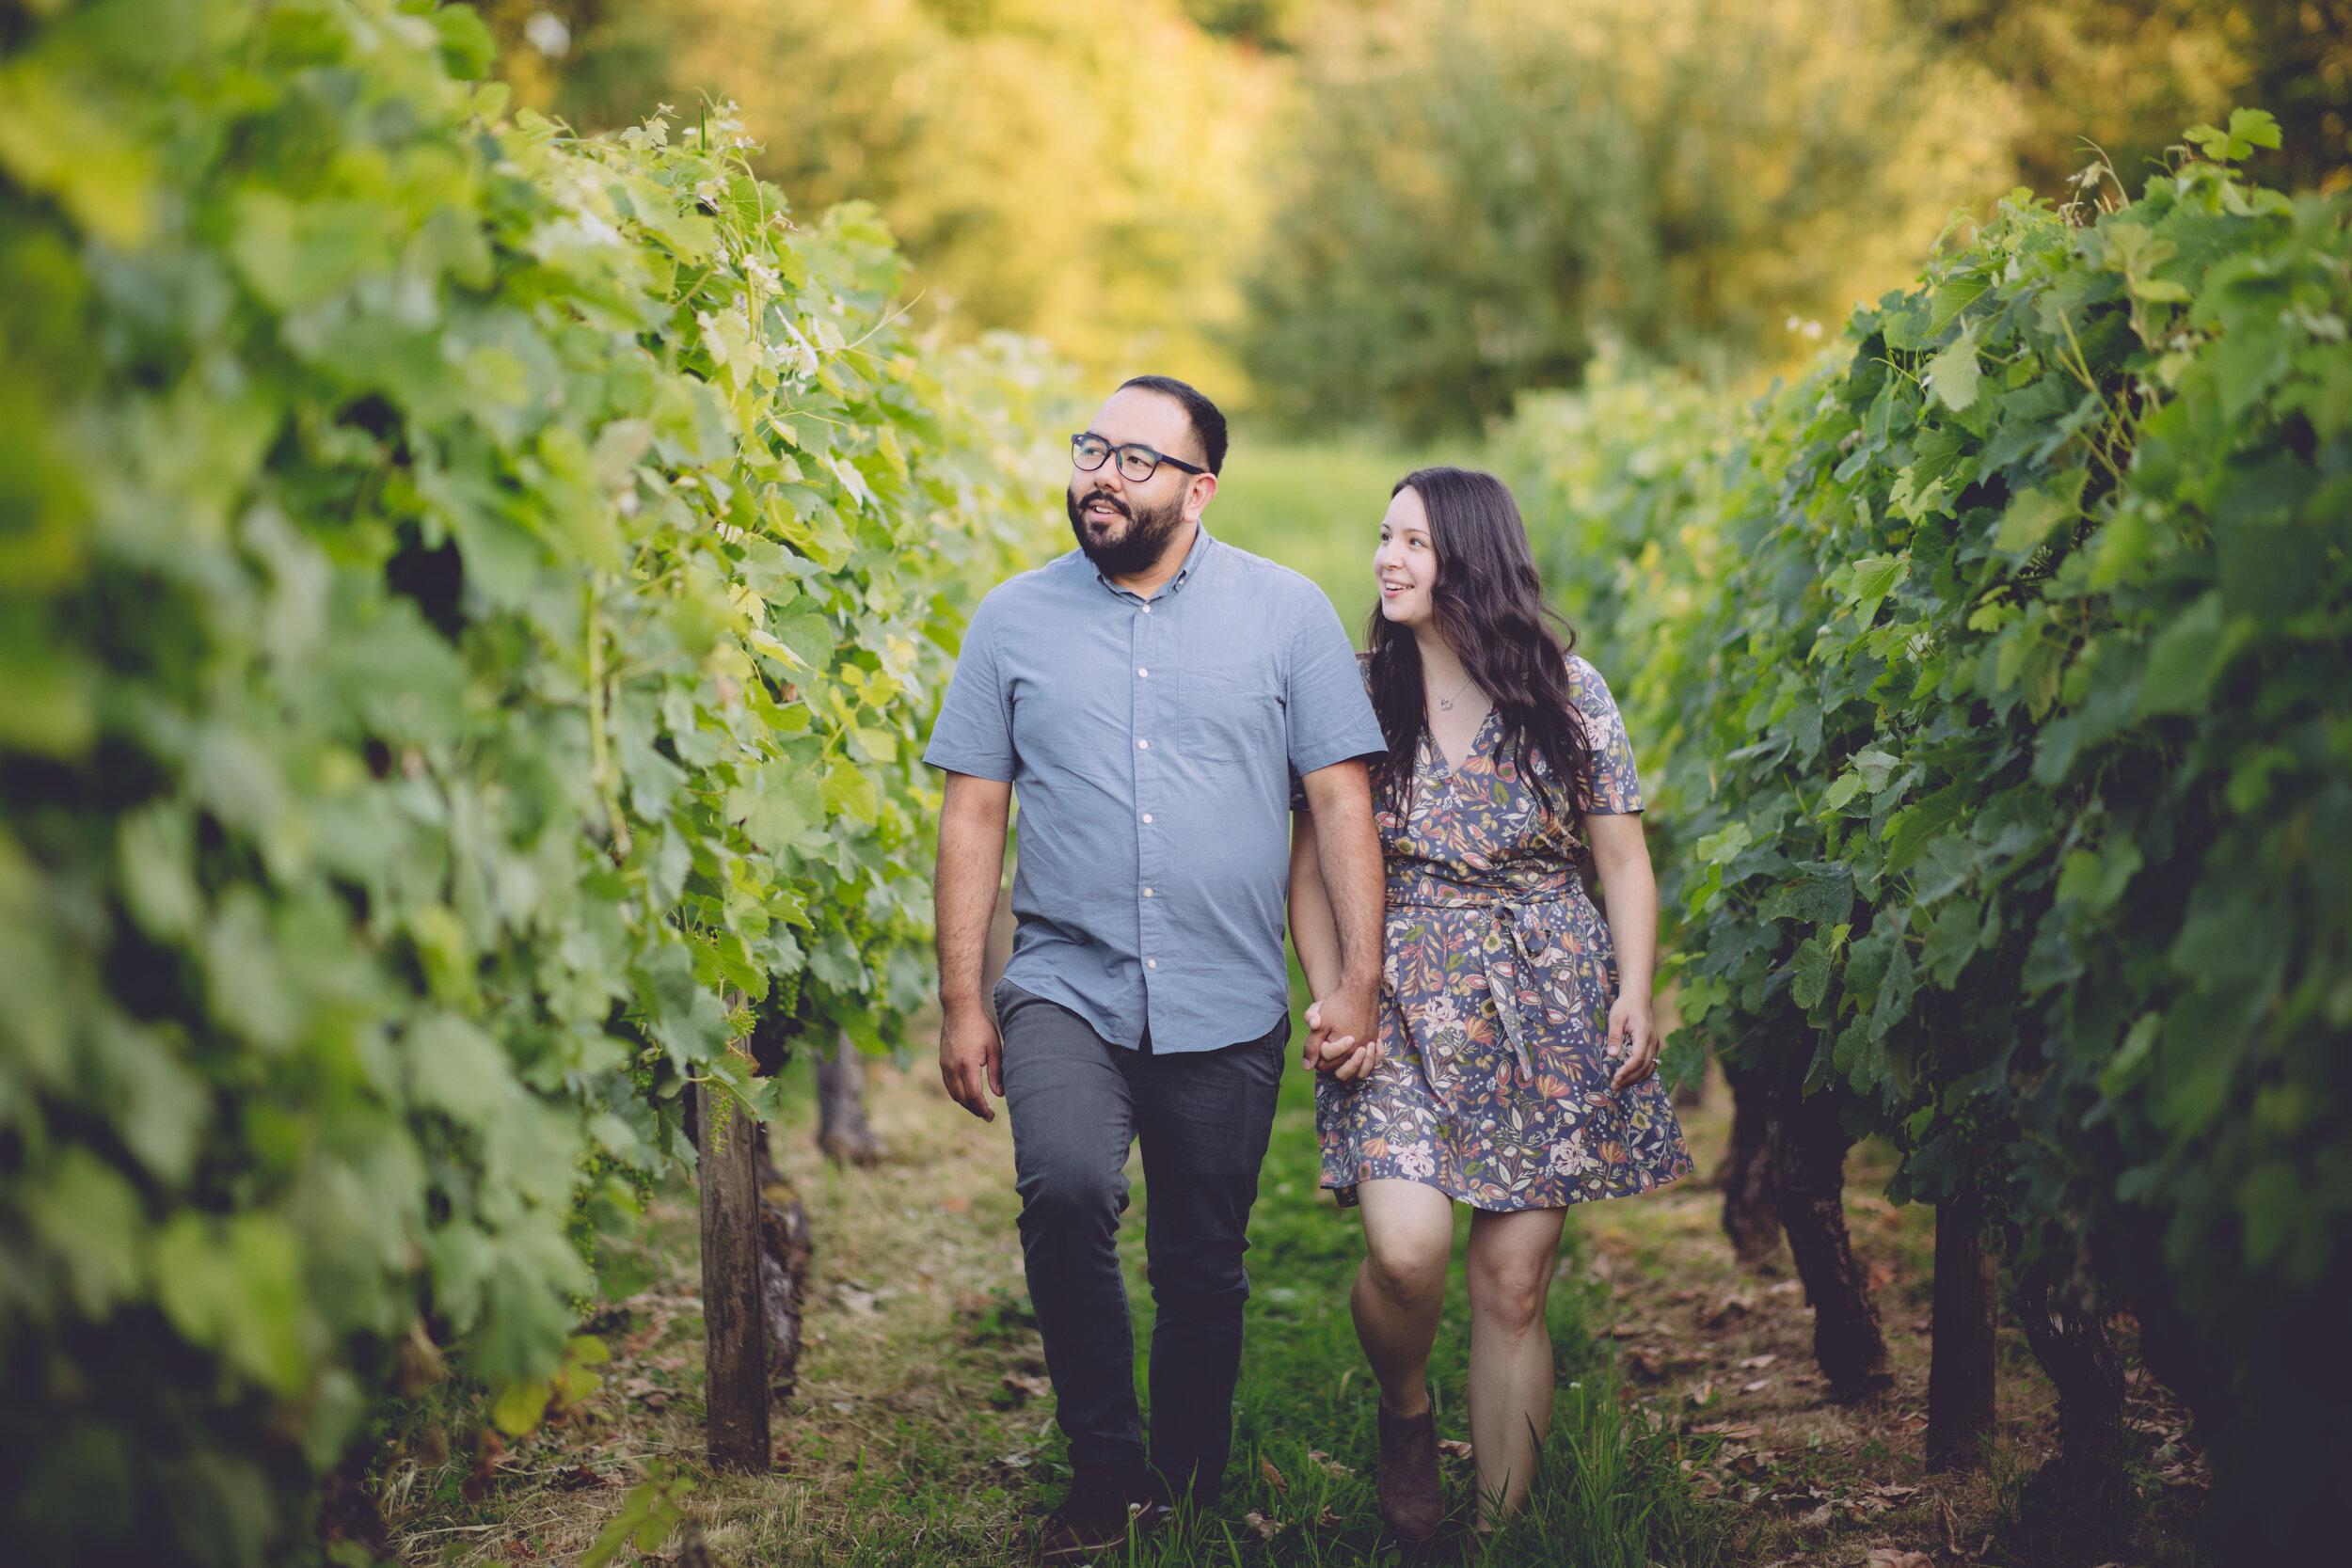 Valerie & Javier-0119.jpg